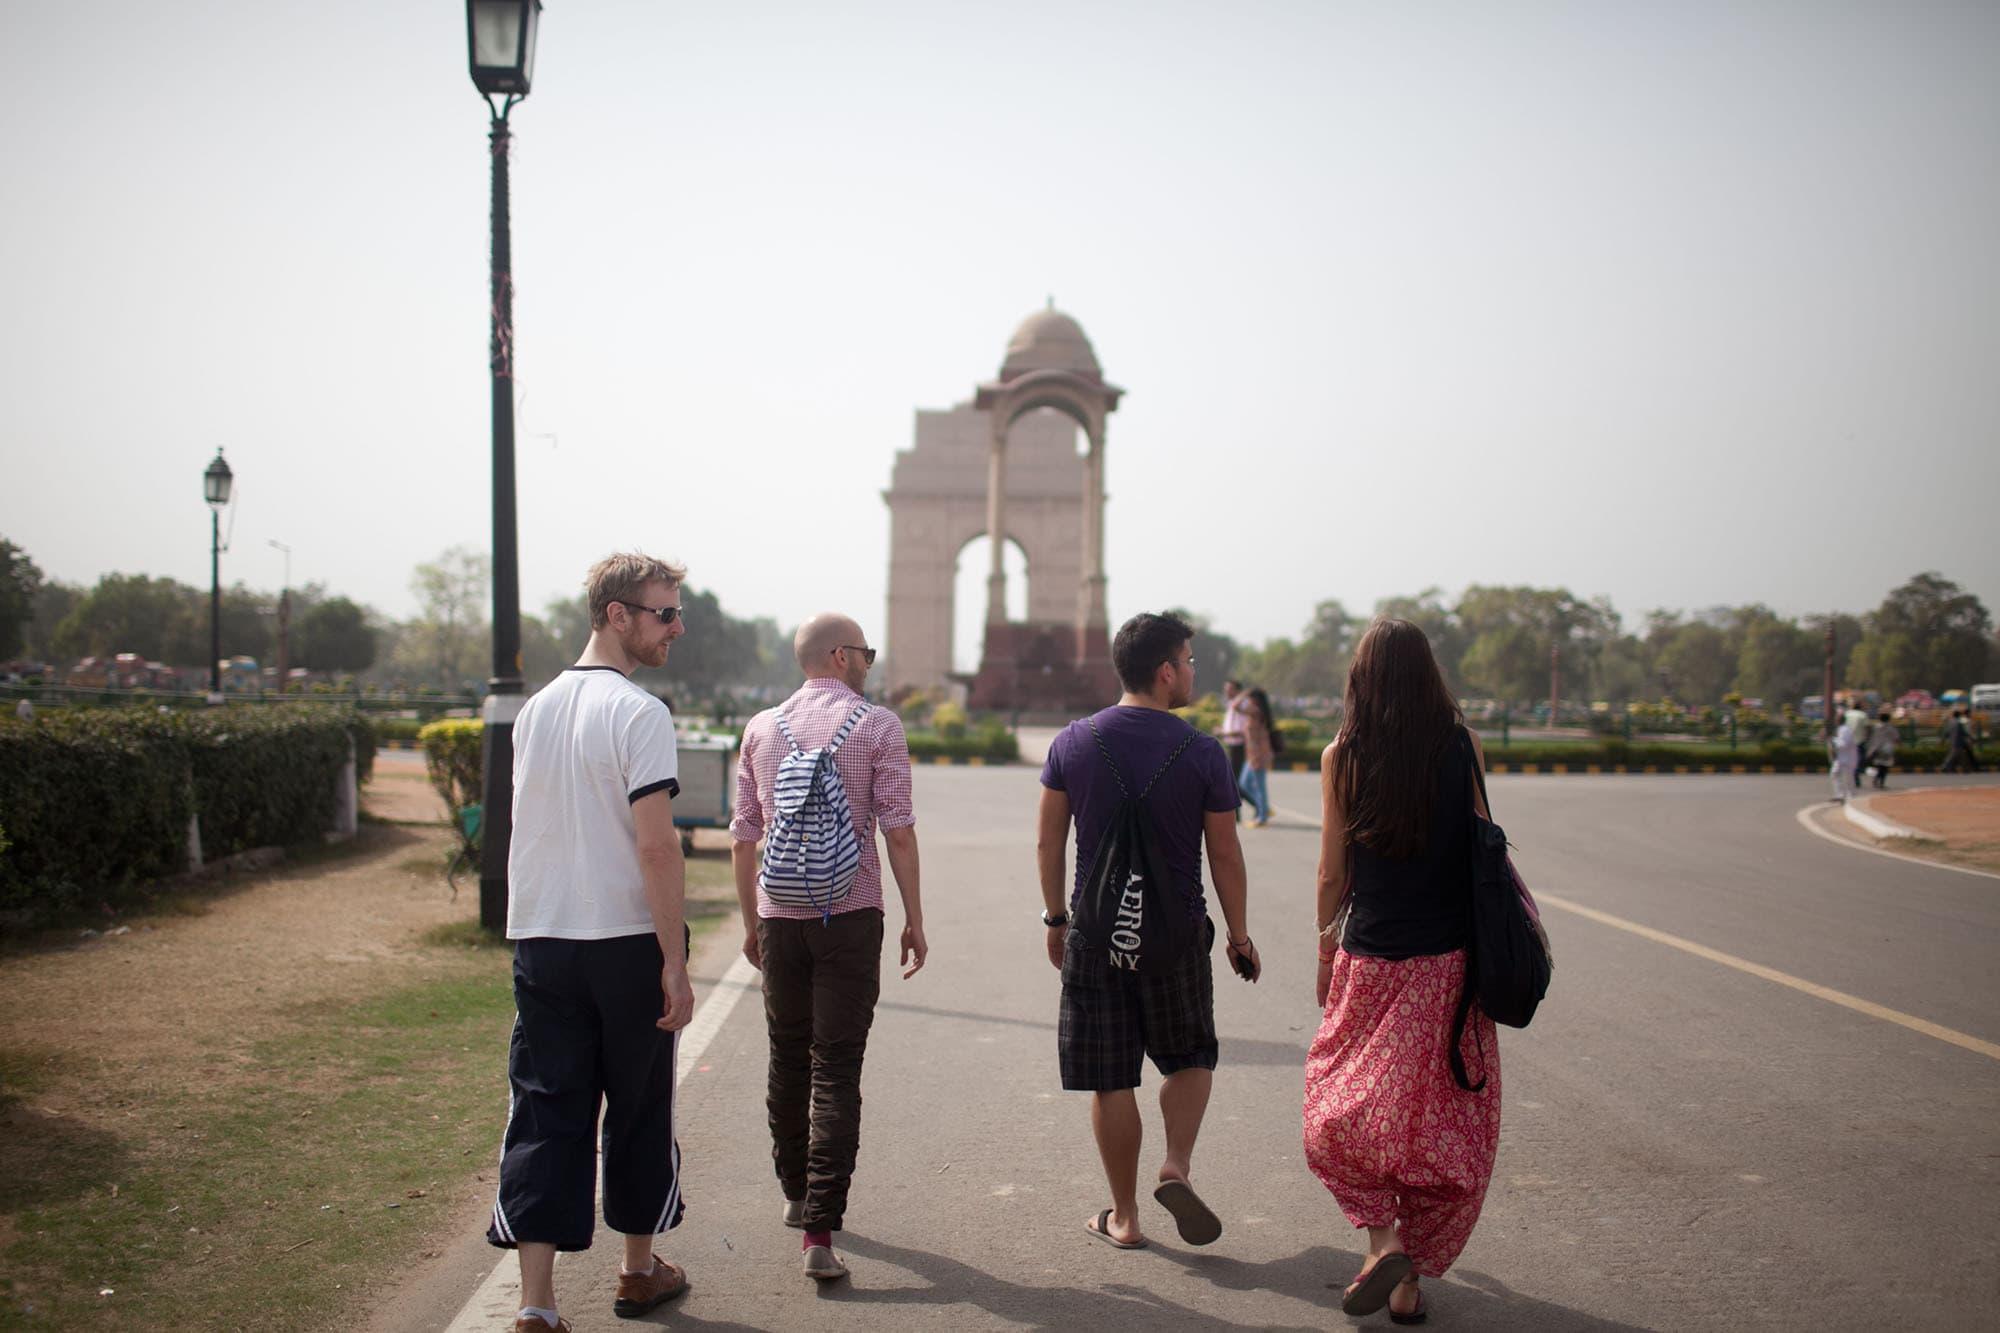 India Gate in New Delhi, India.